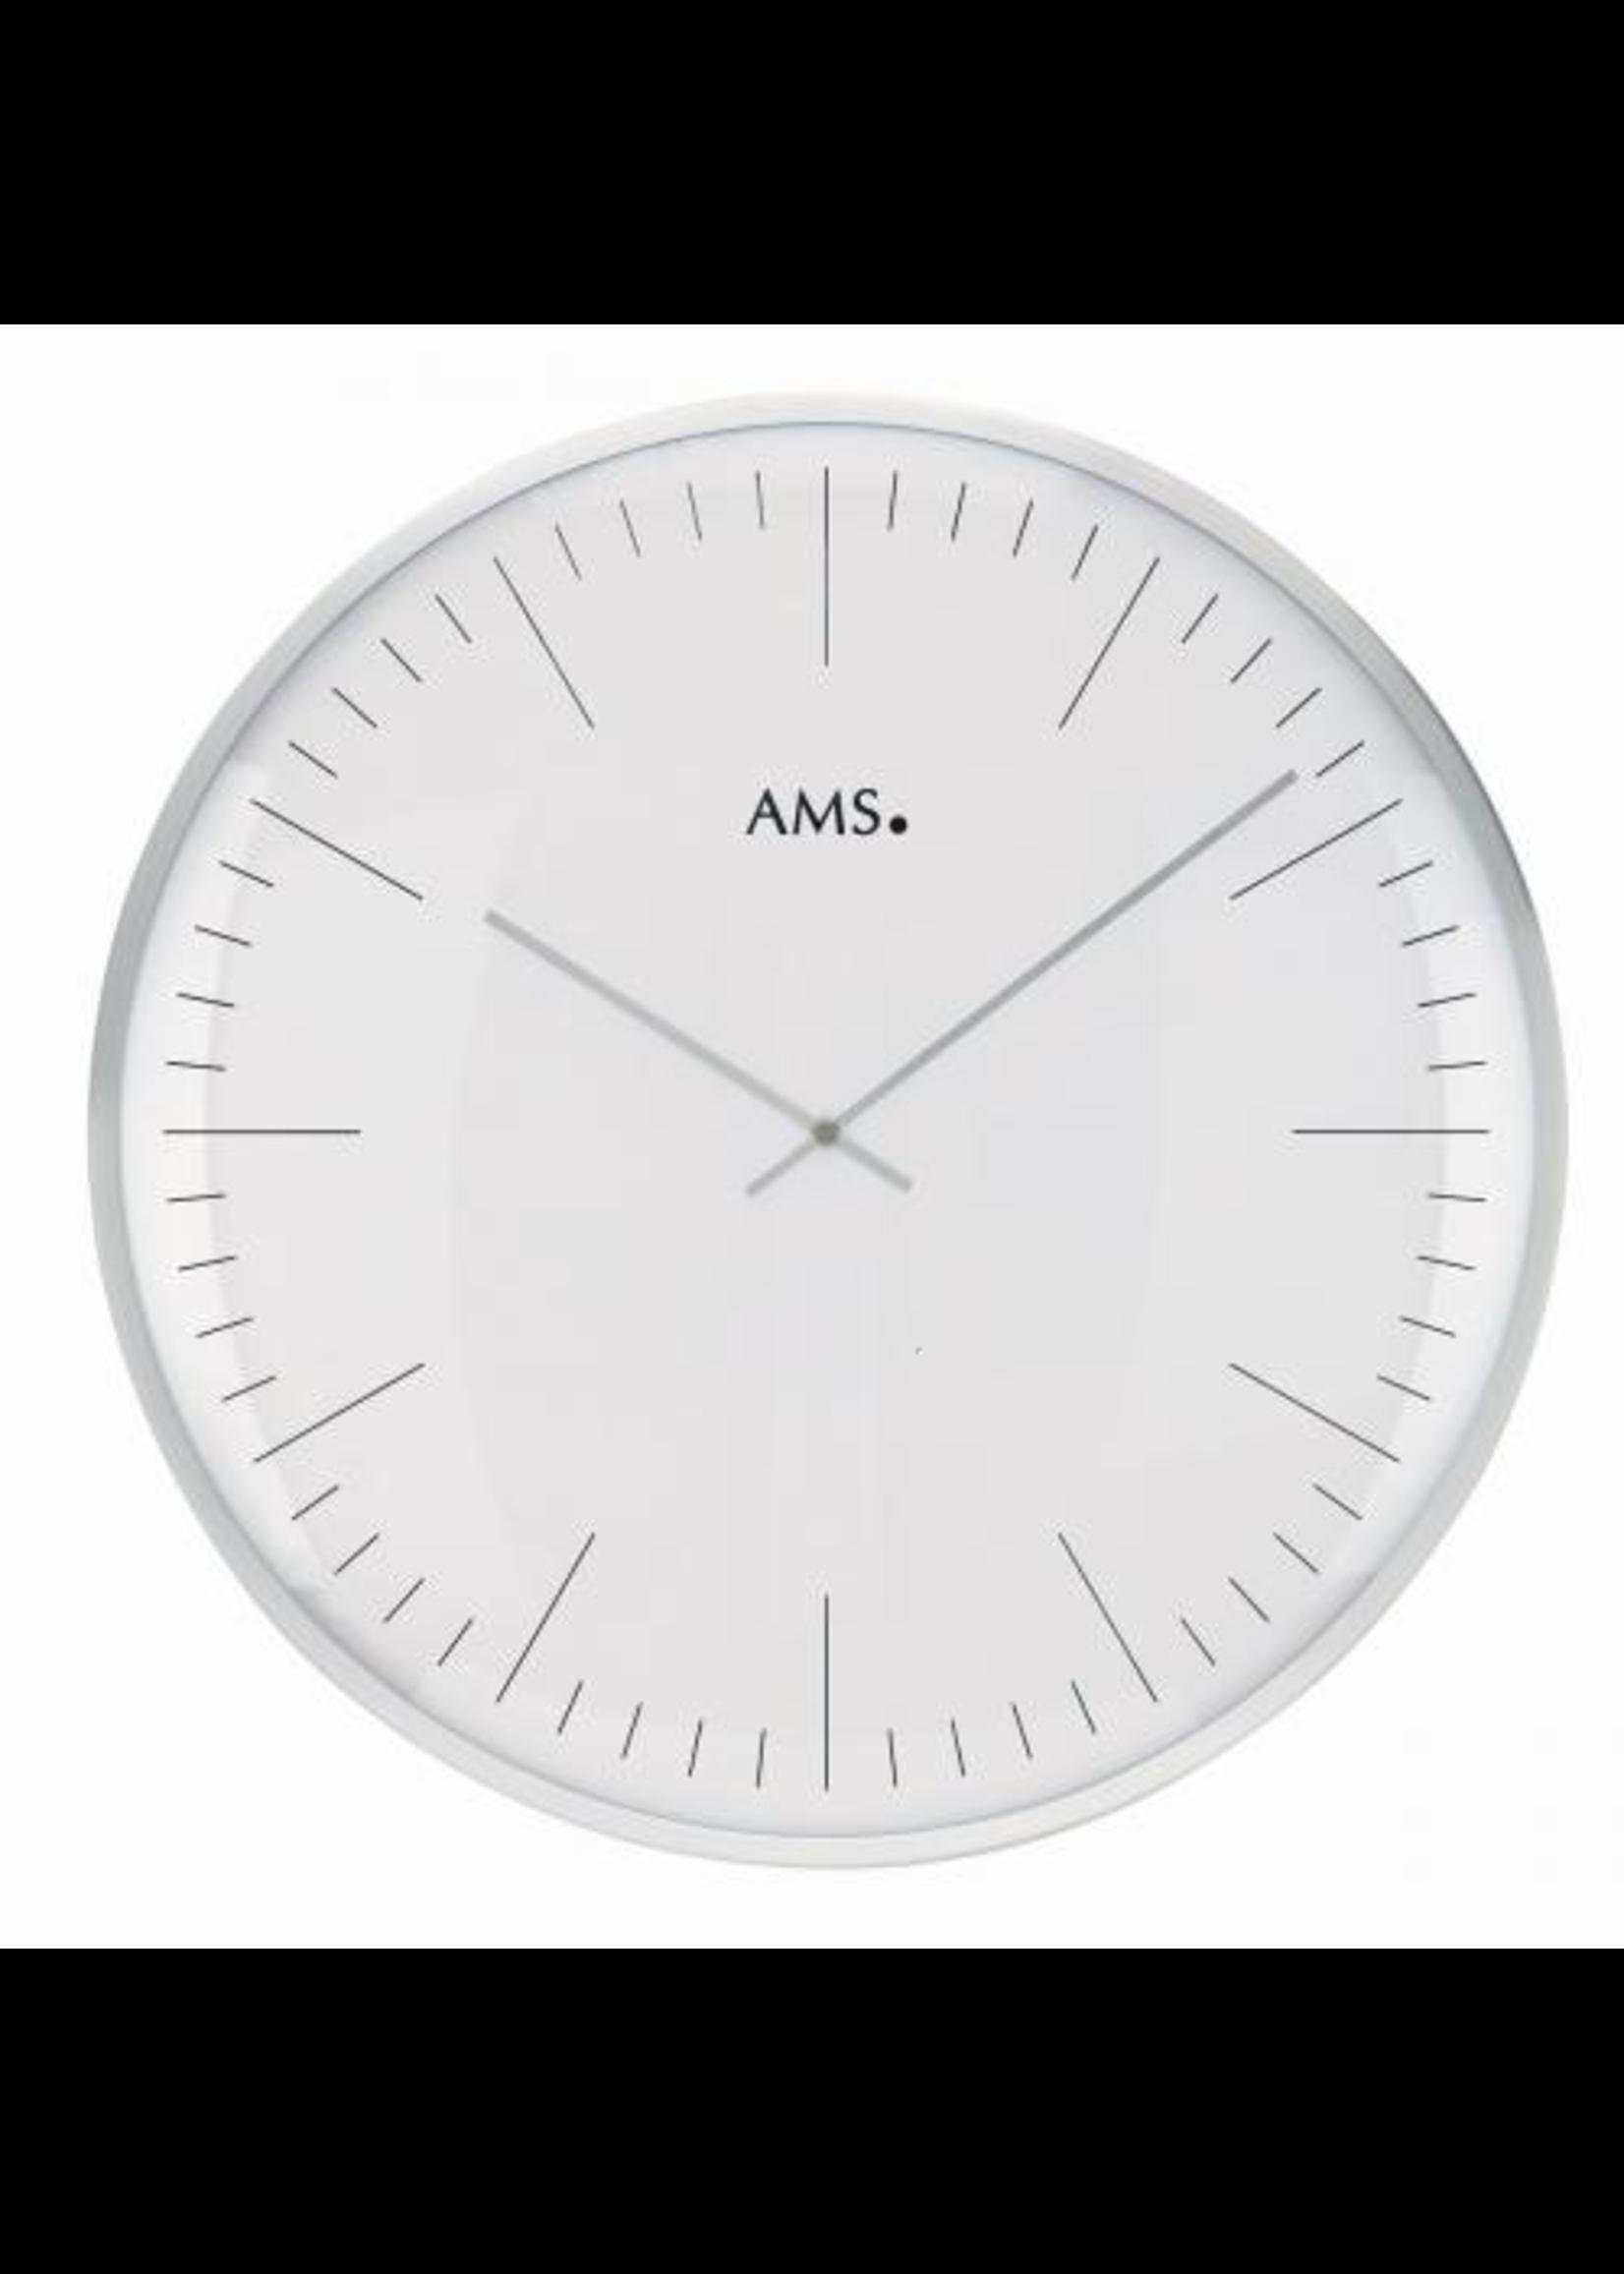 AMS Wandklok Wit en Metaal Modern Design